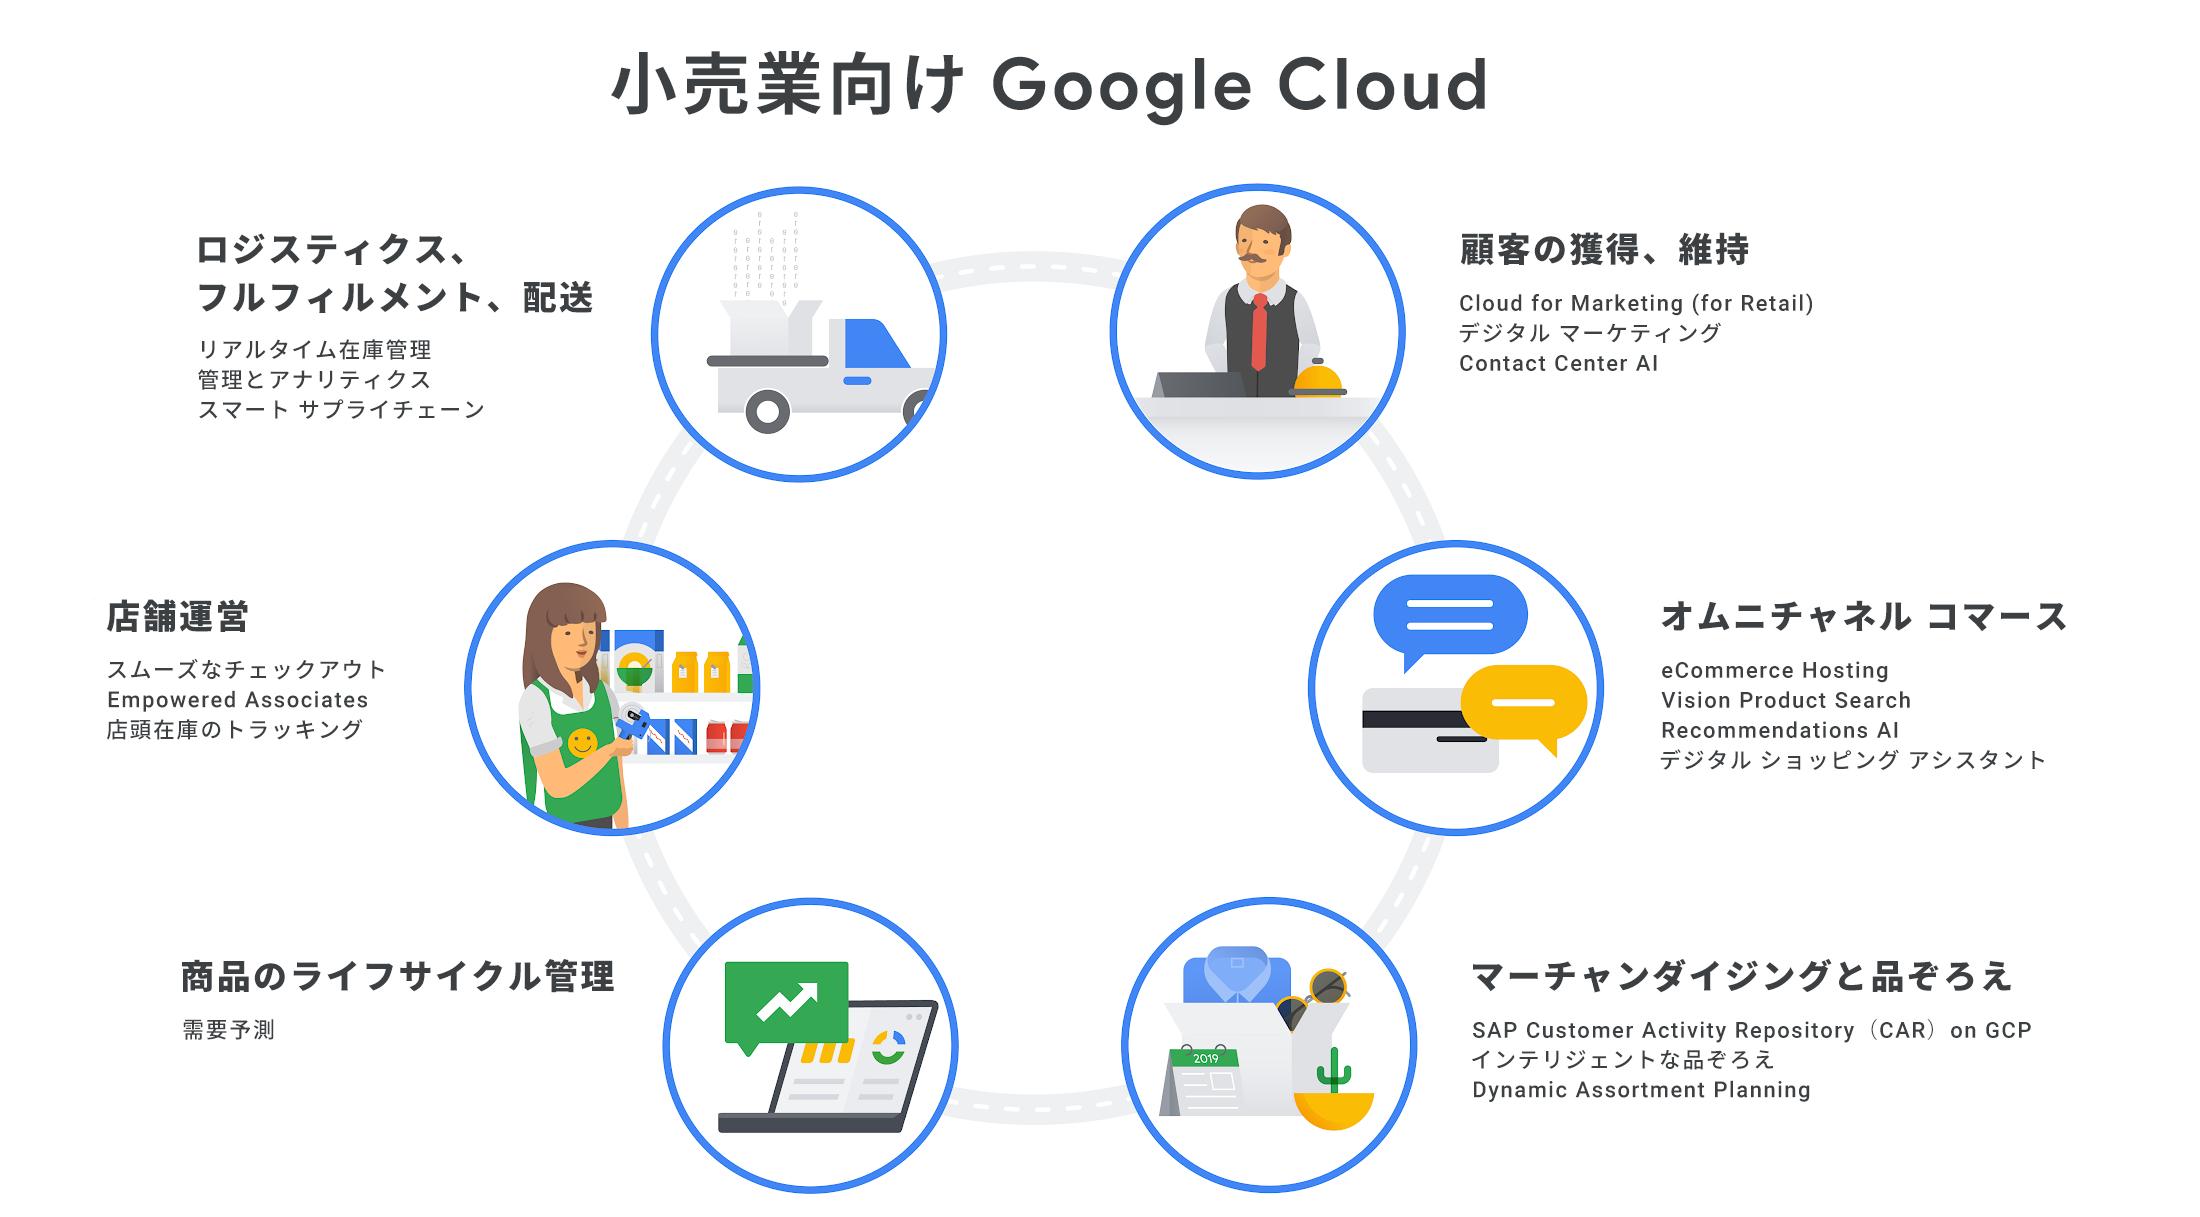 google_cloud_for_retail_JPz25s.PNG